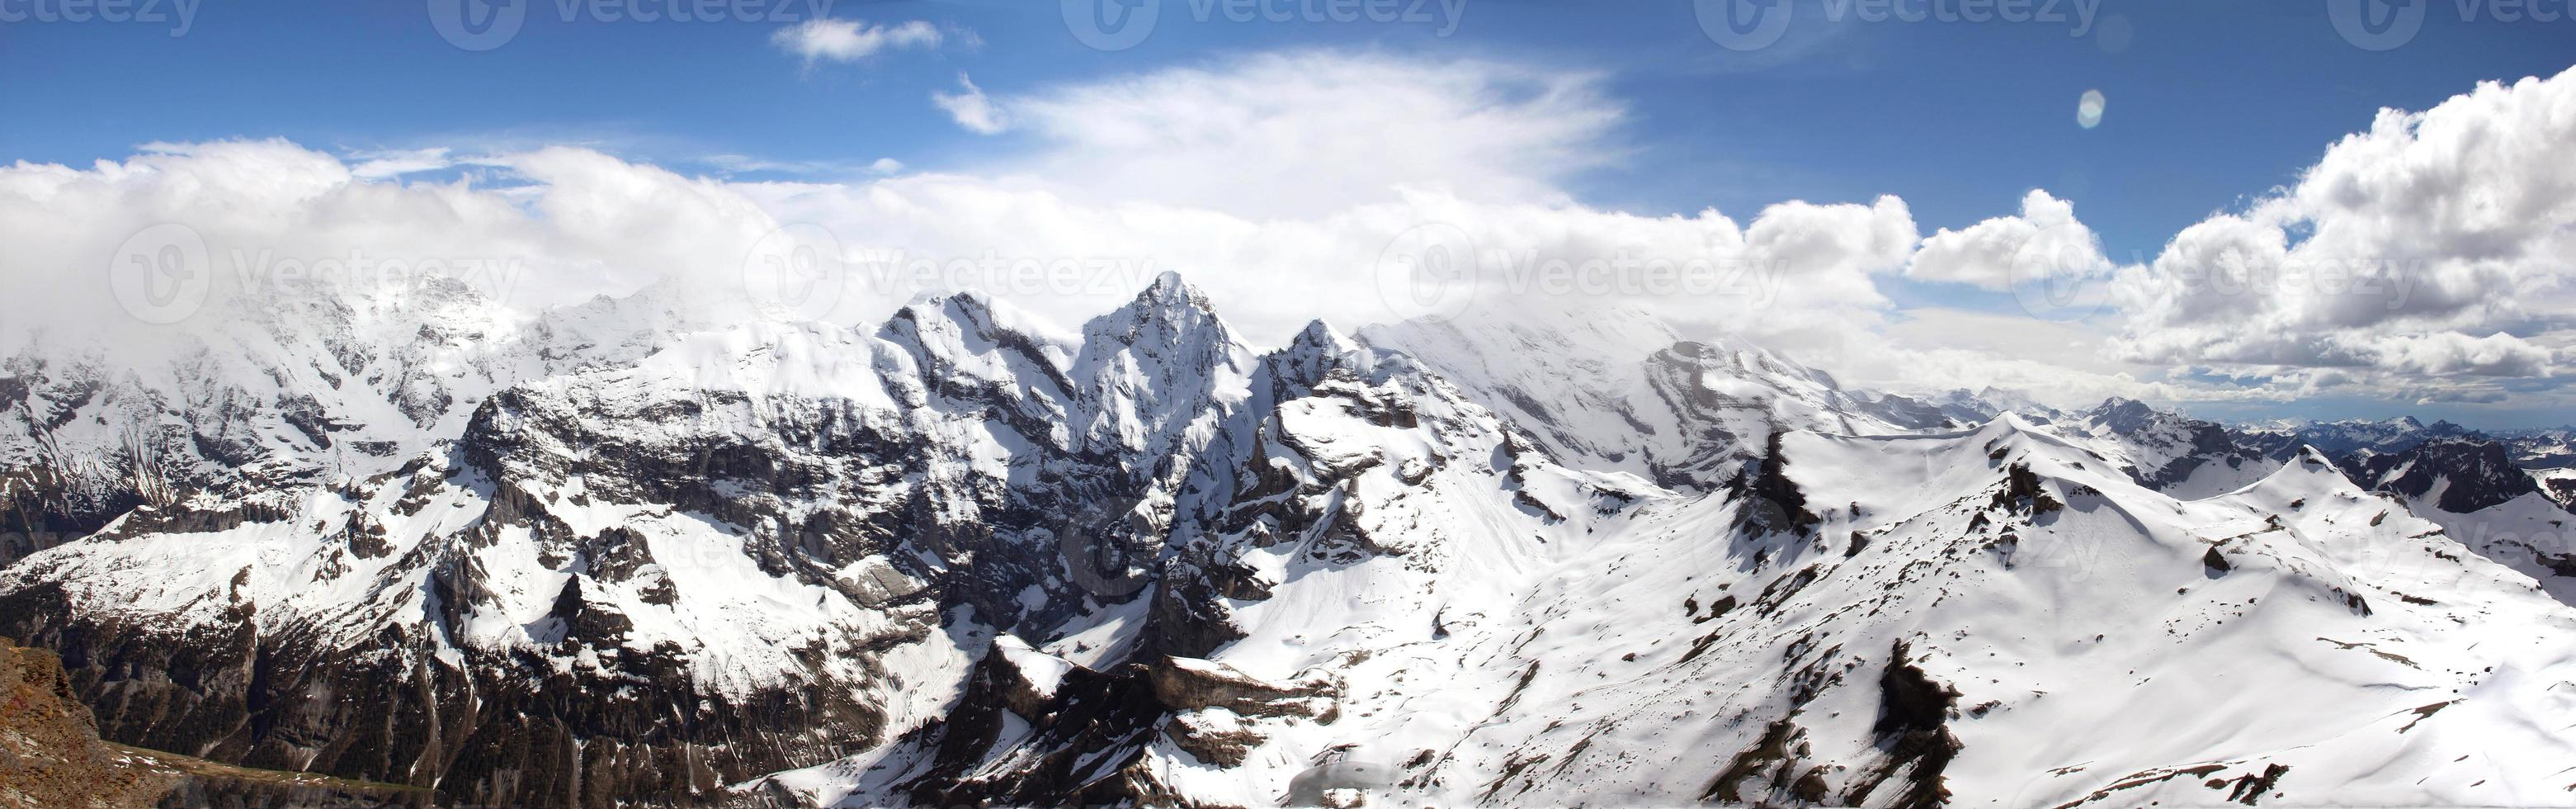 Panamá dos Alpes na Suíça foto